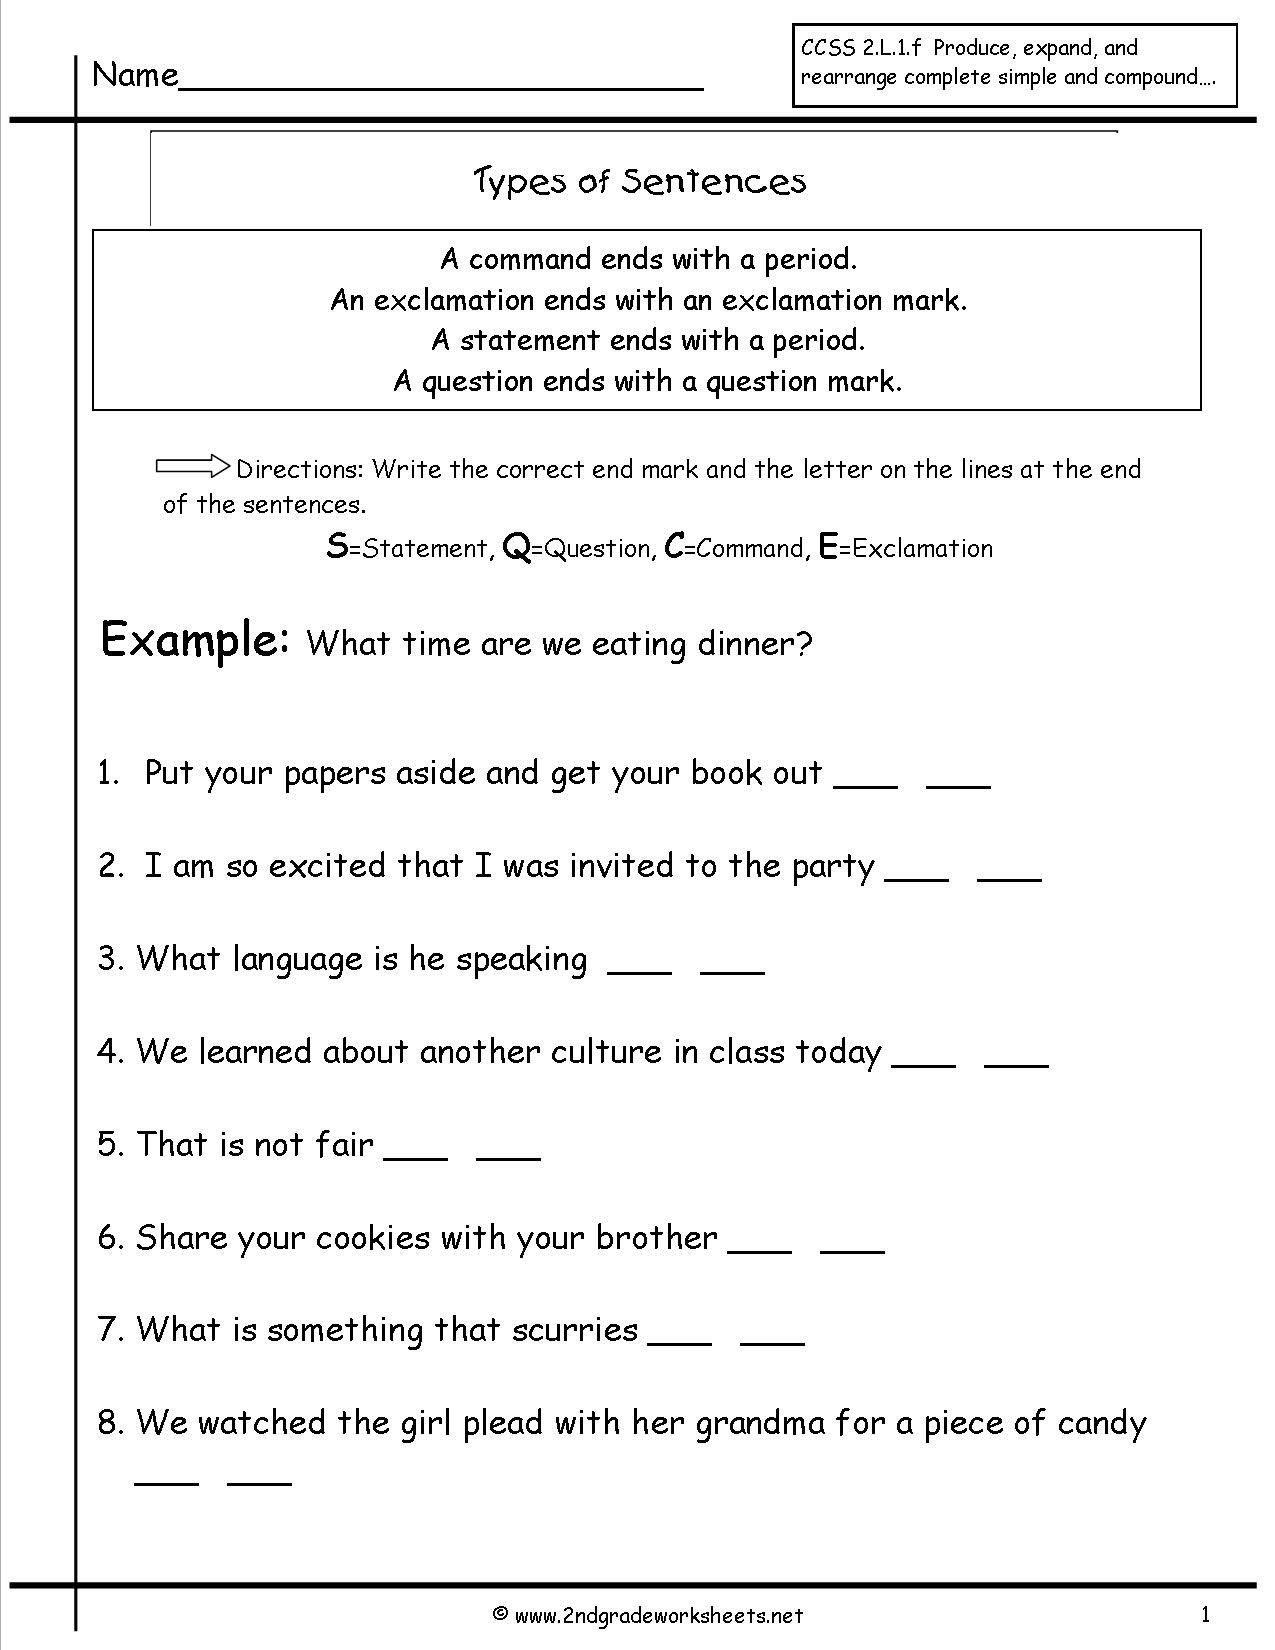 Complex Sentences Worksheet 5th Grade Second Grade Sentences Worksheets  Ccss 4th S… in 2020   Types of sentences worksheet [ 1650 x 1275 Pixel ]